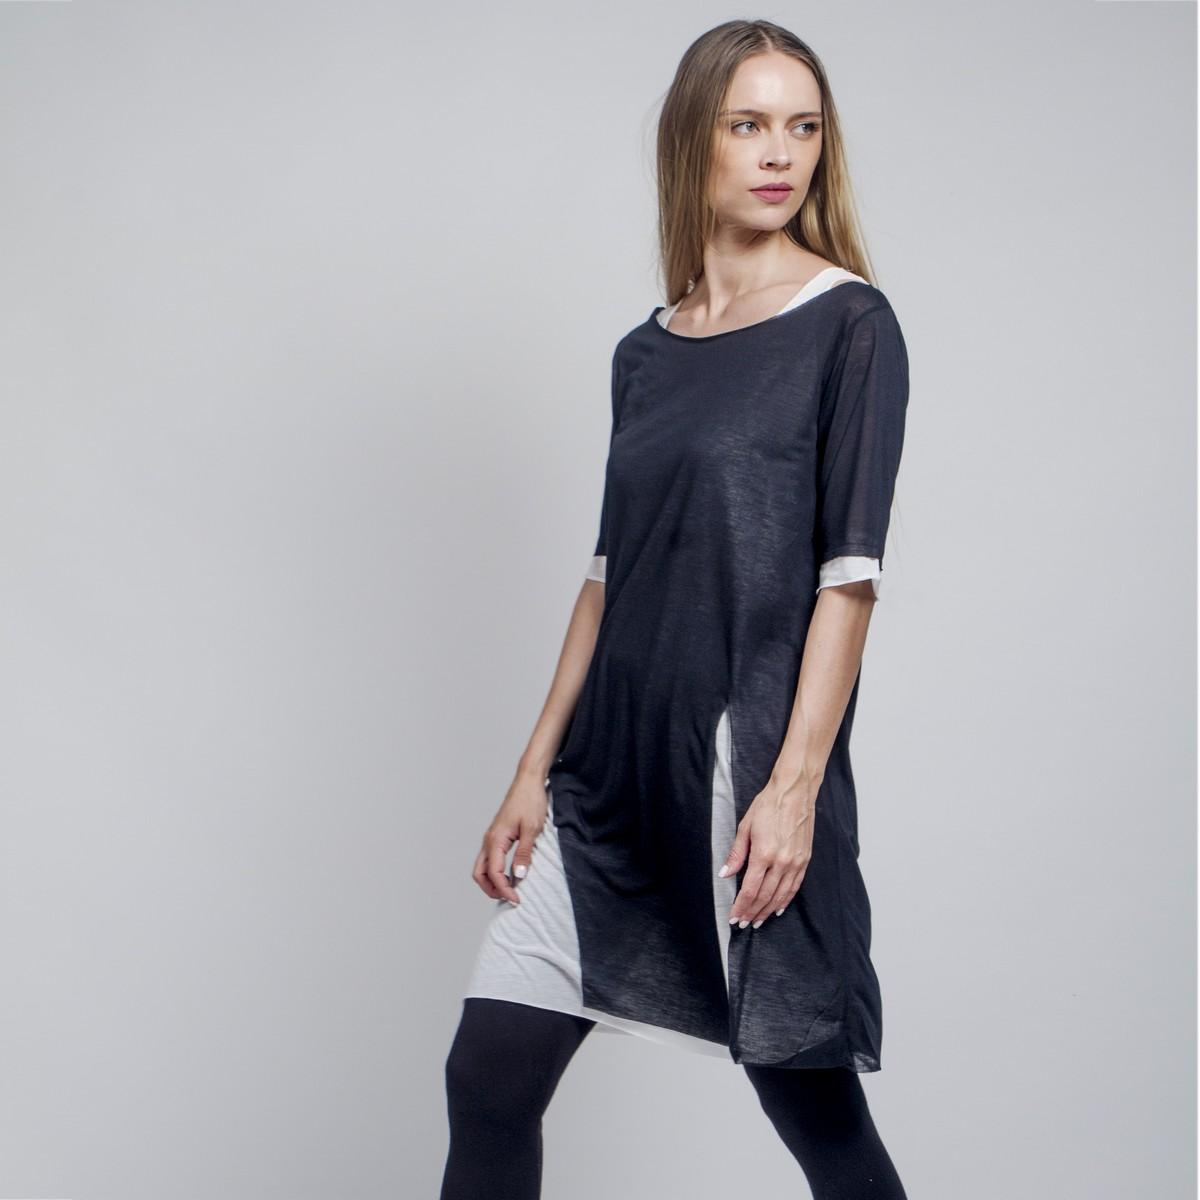 fc5b2d6d3de2 Διπλή μπλούζα από γάζα - Γυναικεία Ρούχα - Φορέματα - Xanashop